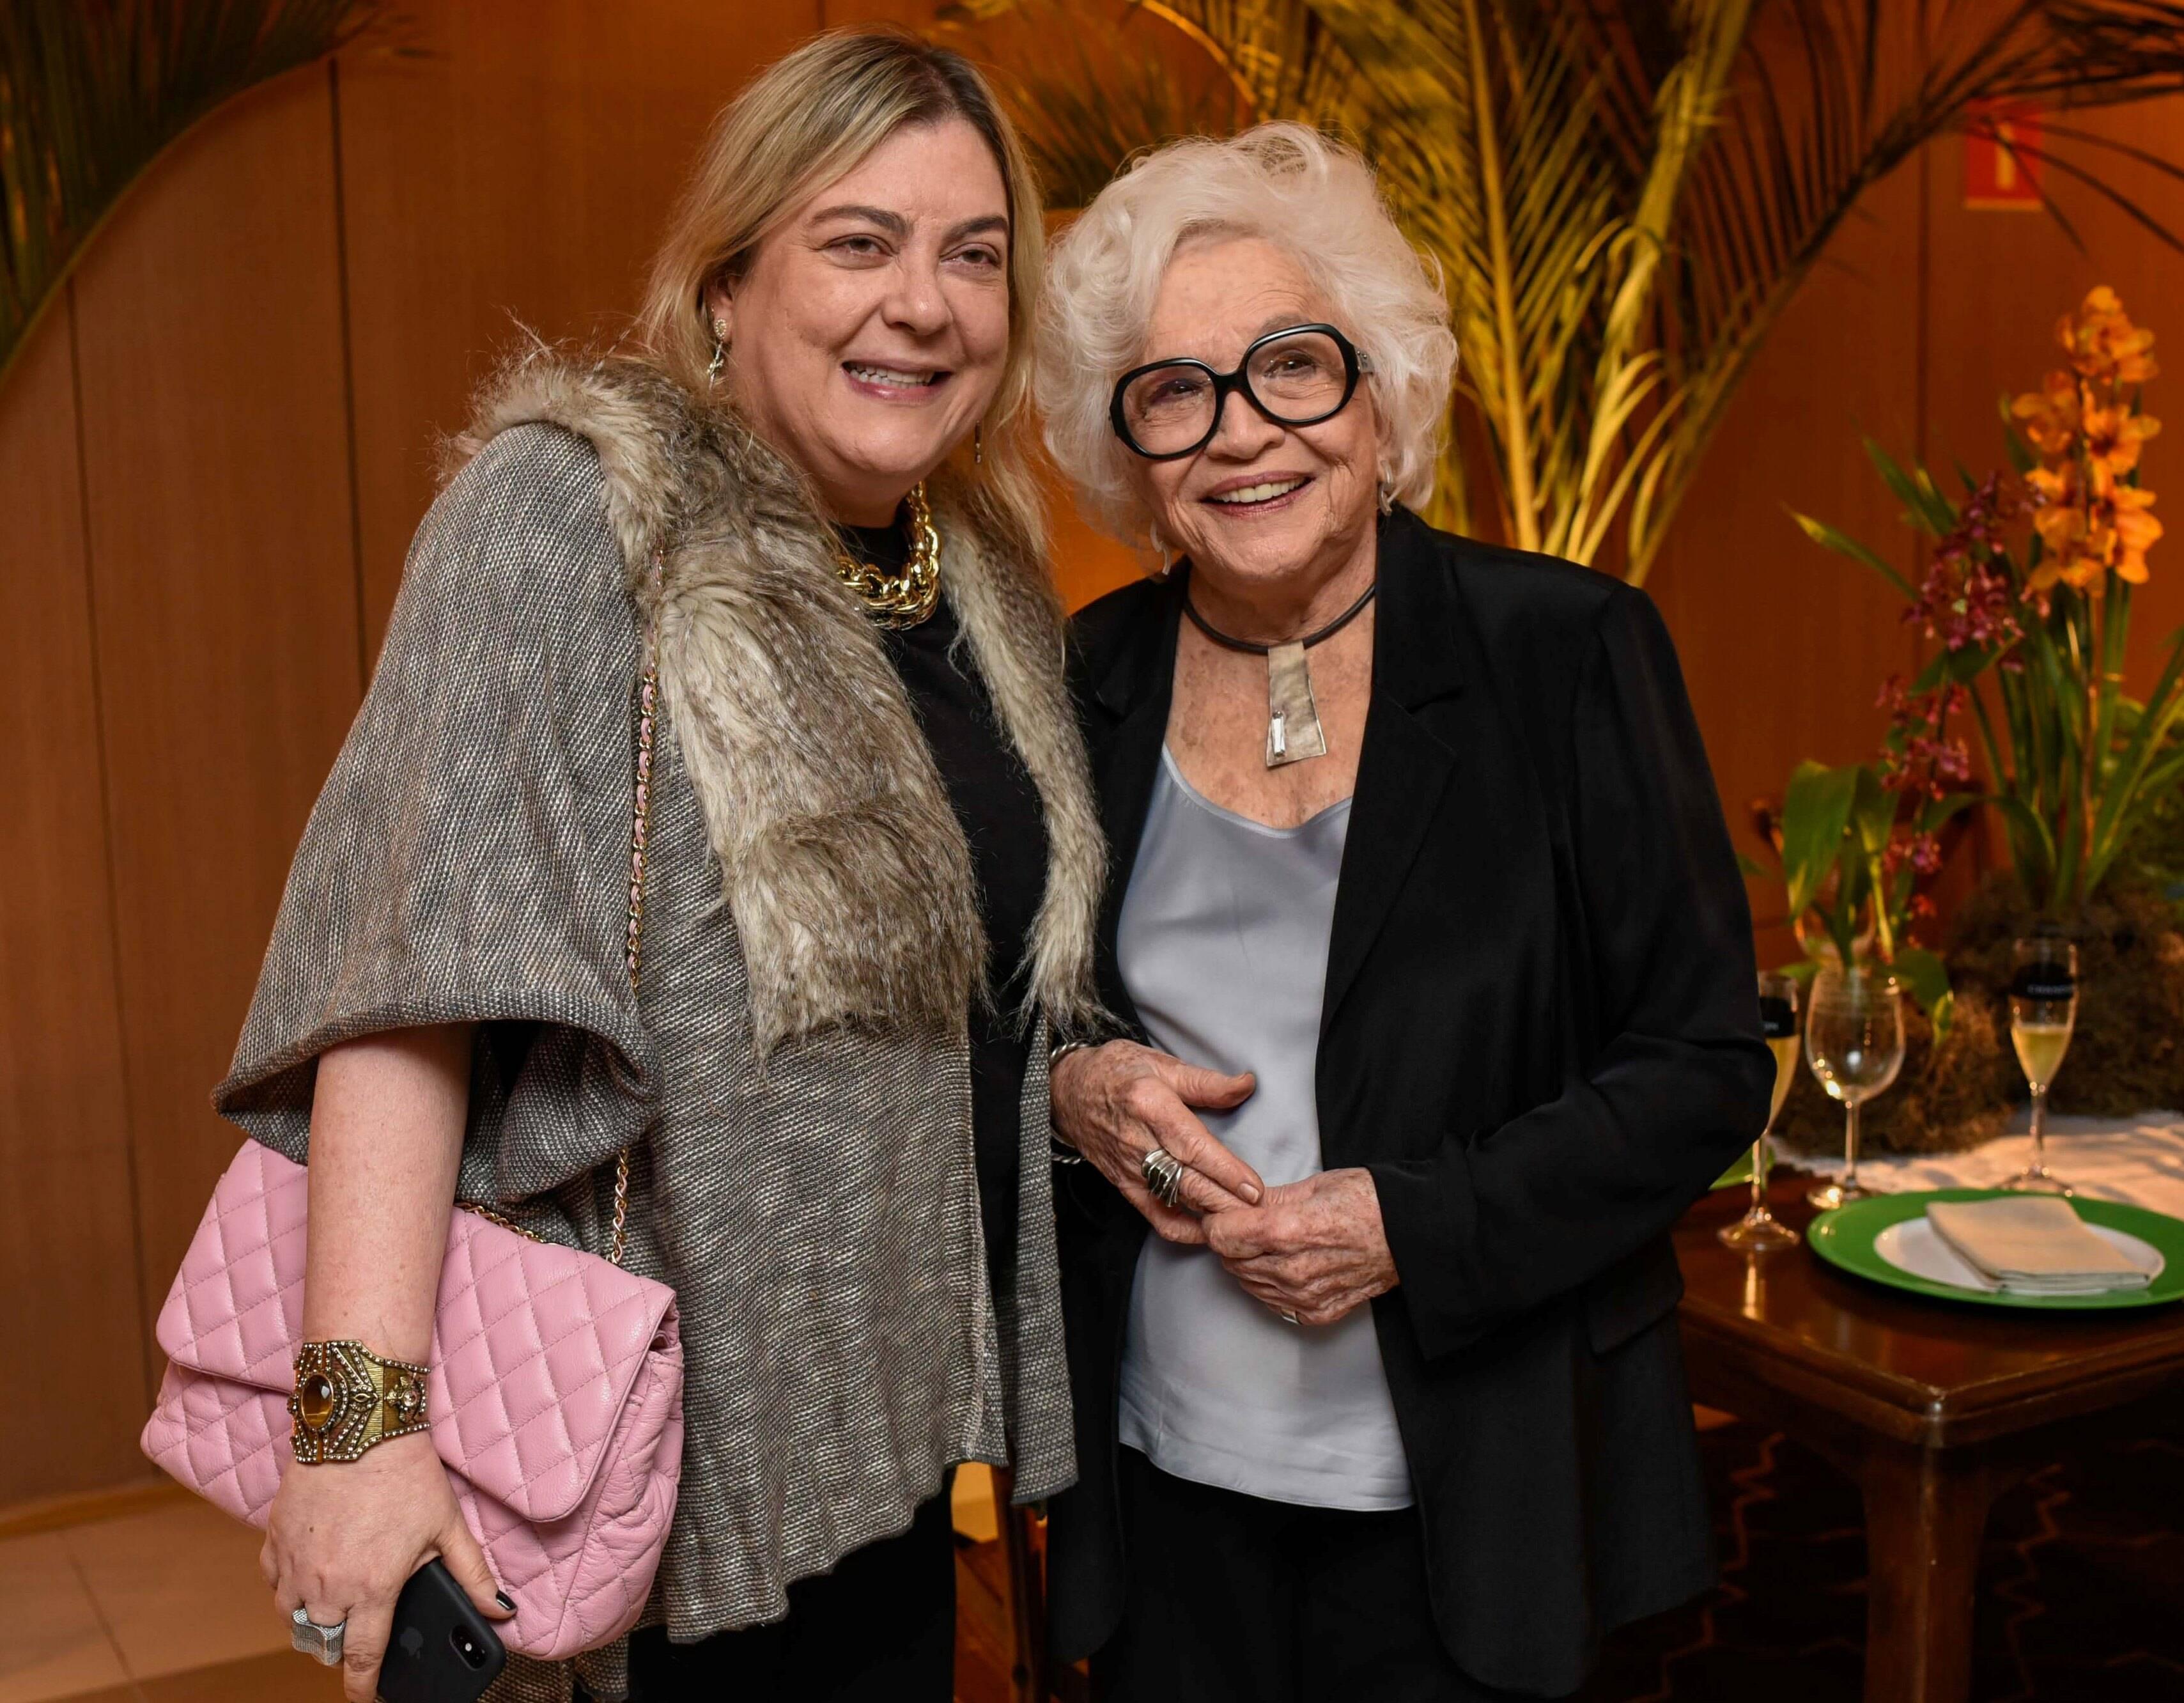 Heloisa Tolipan e Nathália Timberg  /Foto: Mariama Prieto